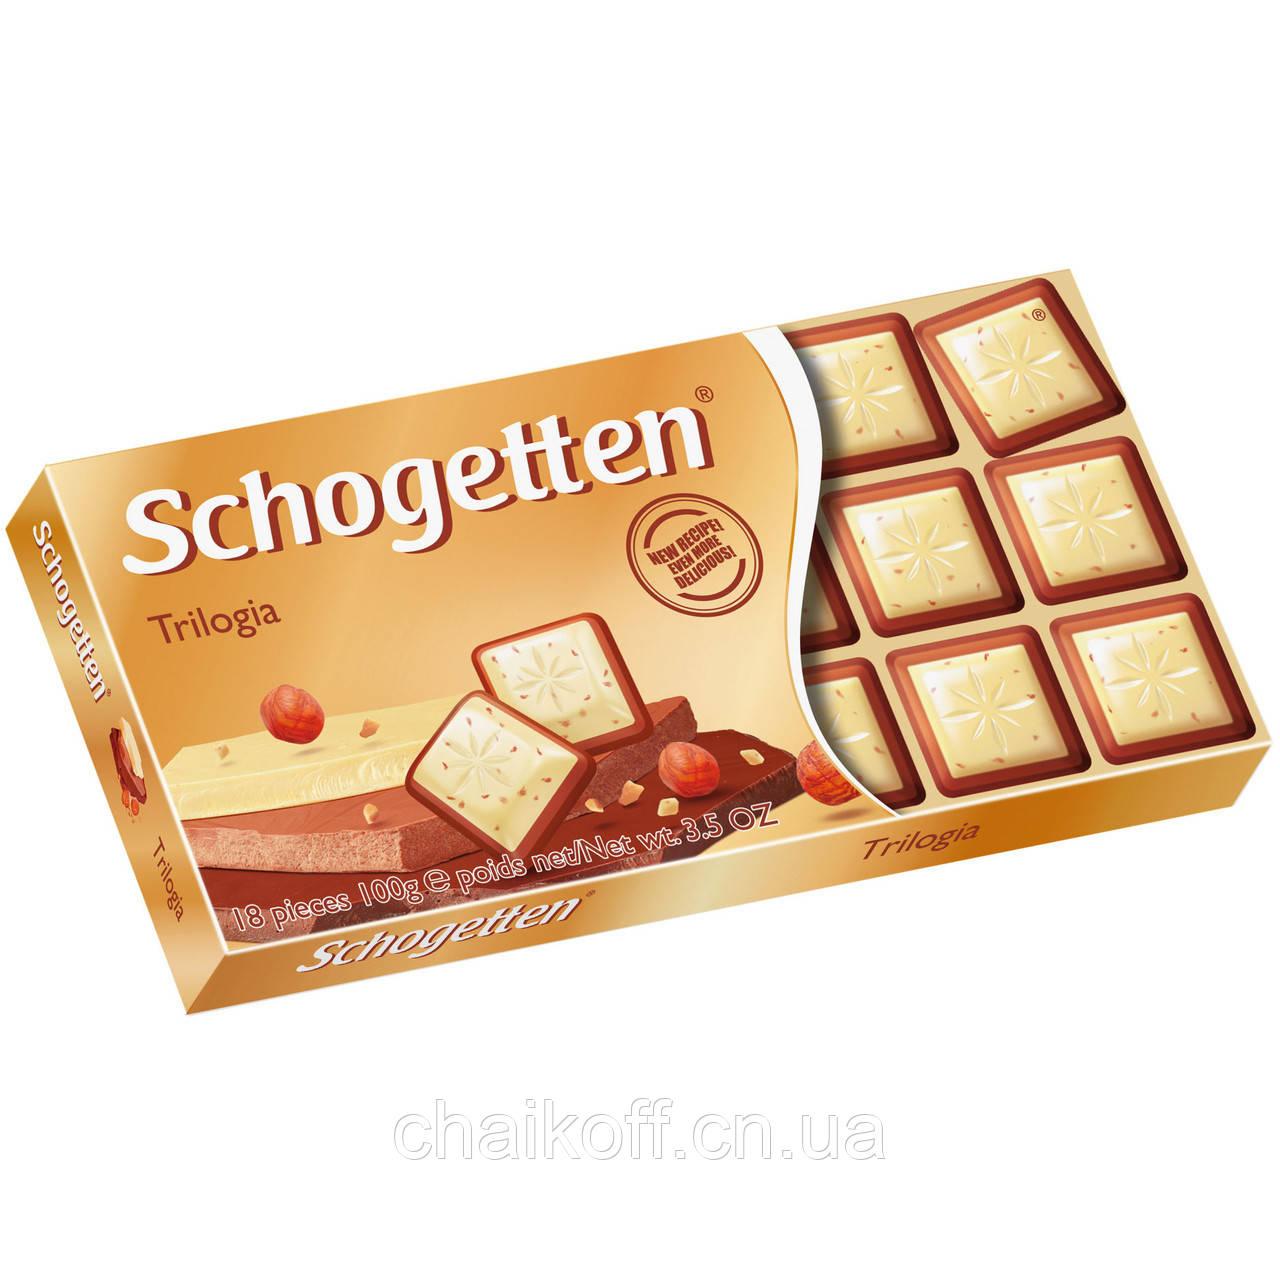 Шоколад Schogetten  Trilogia 100 г (Германия)